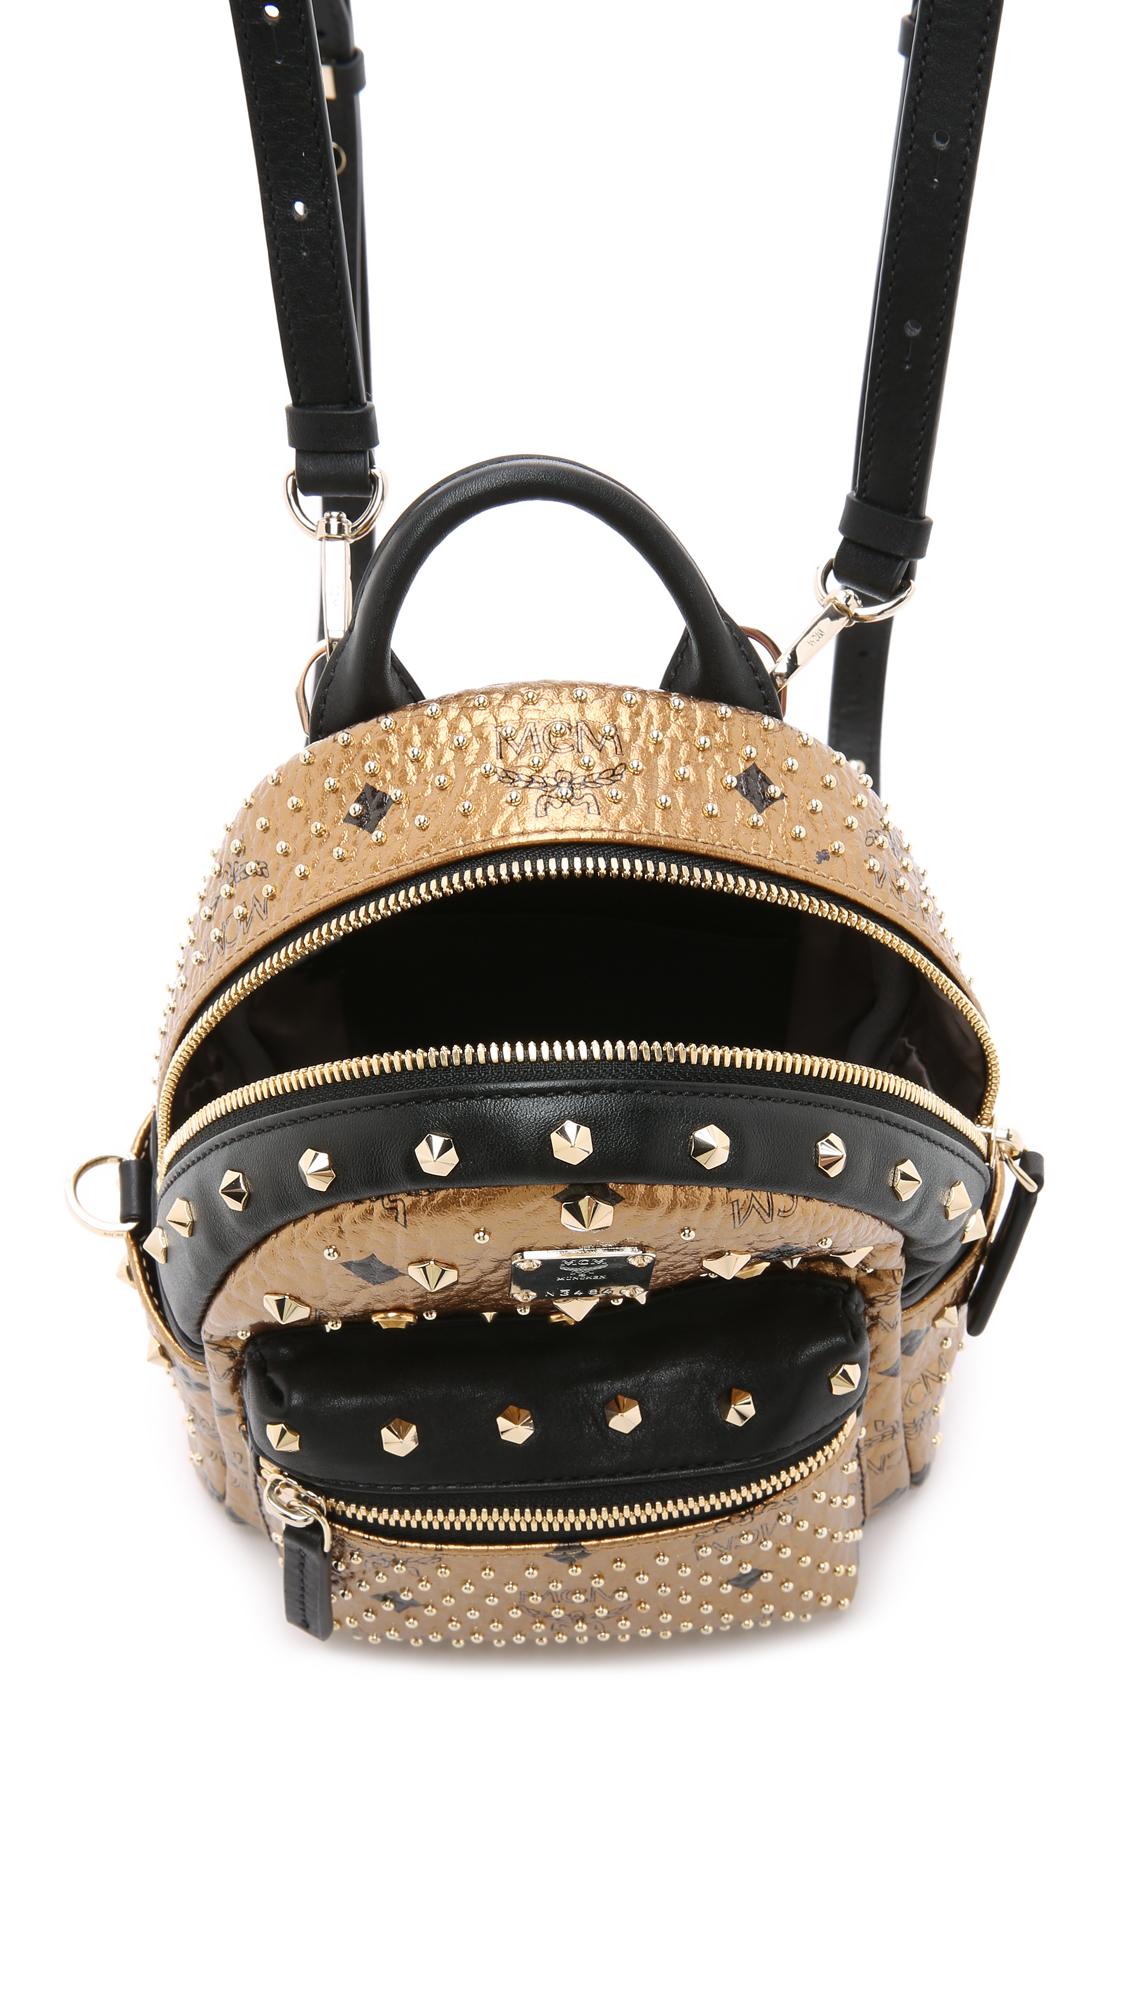 Mcm Crystal Stud Baby Stark Backpack Gold In Metallic Lyst